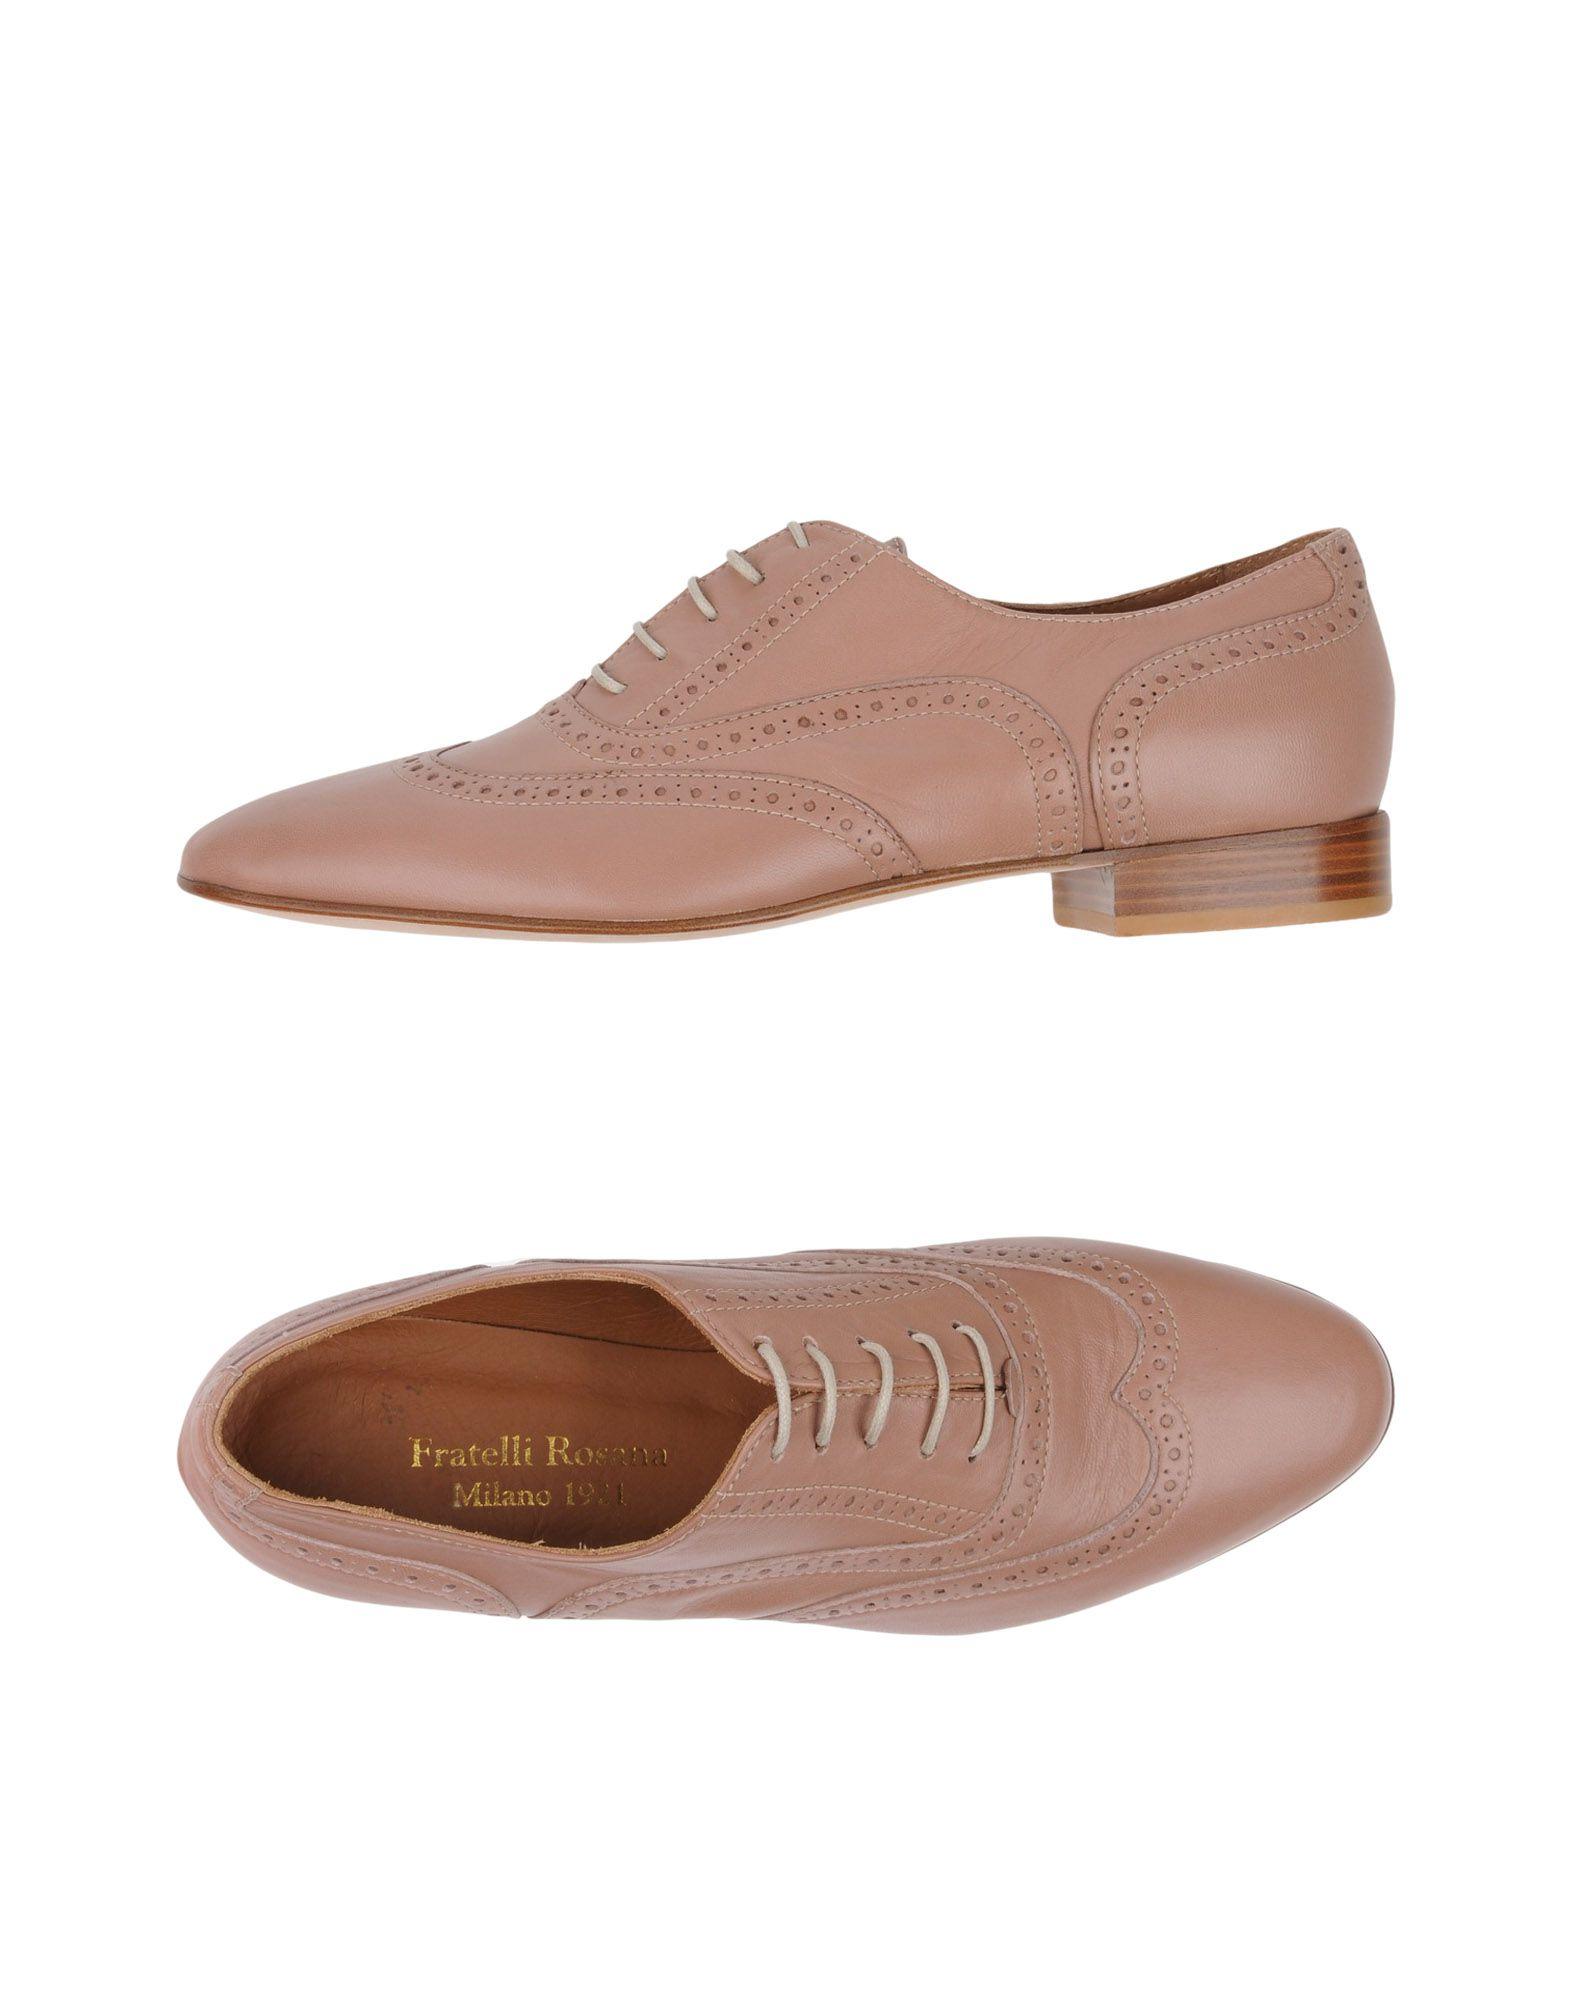 F.LLI ROSANA Обувь на шнурках rosana estado de mexico